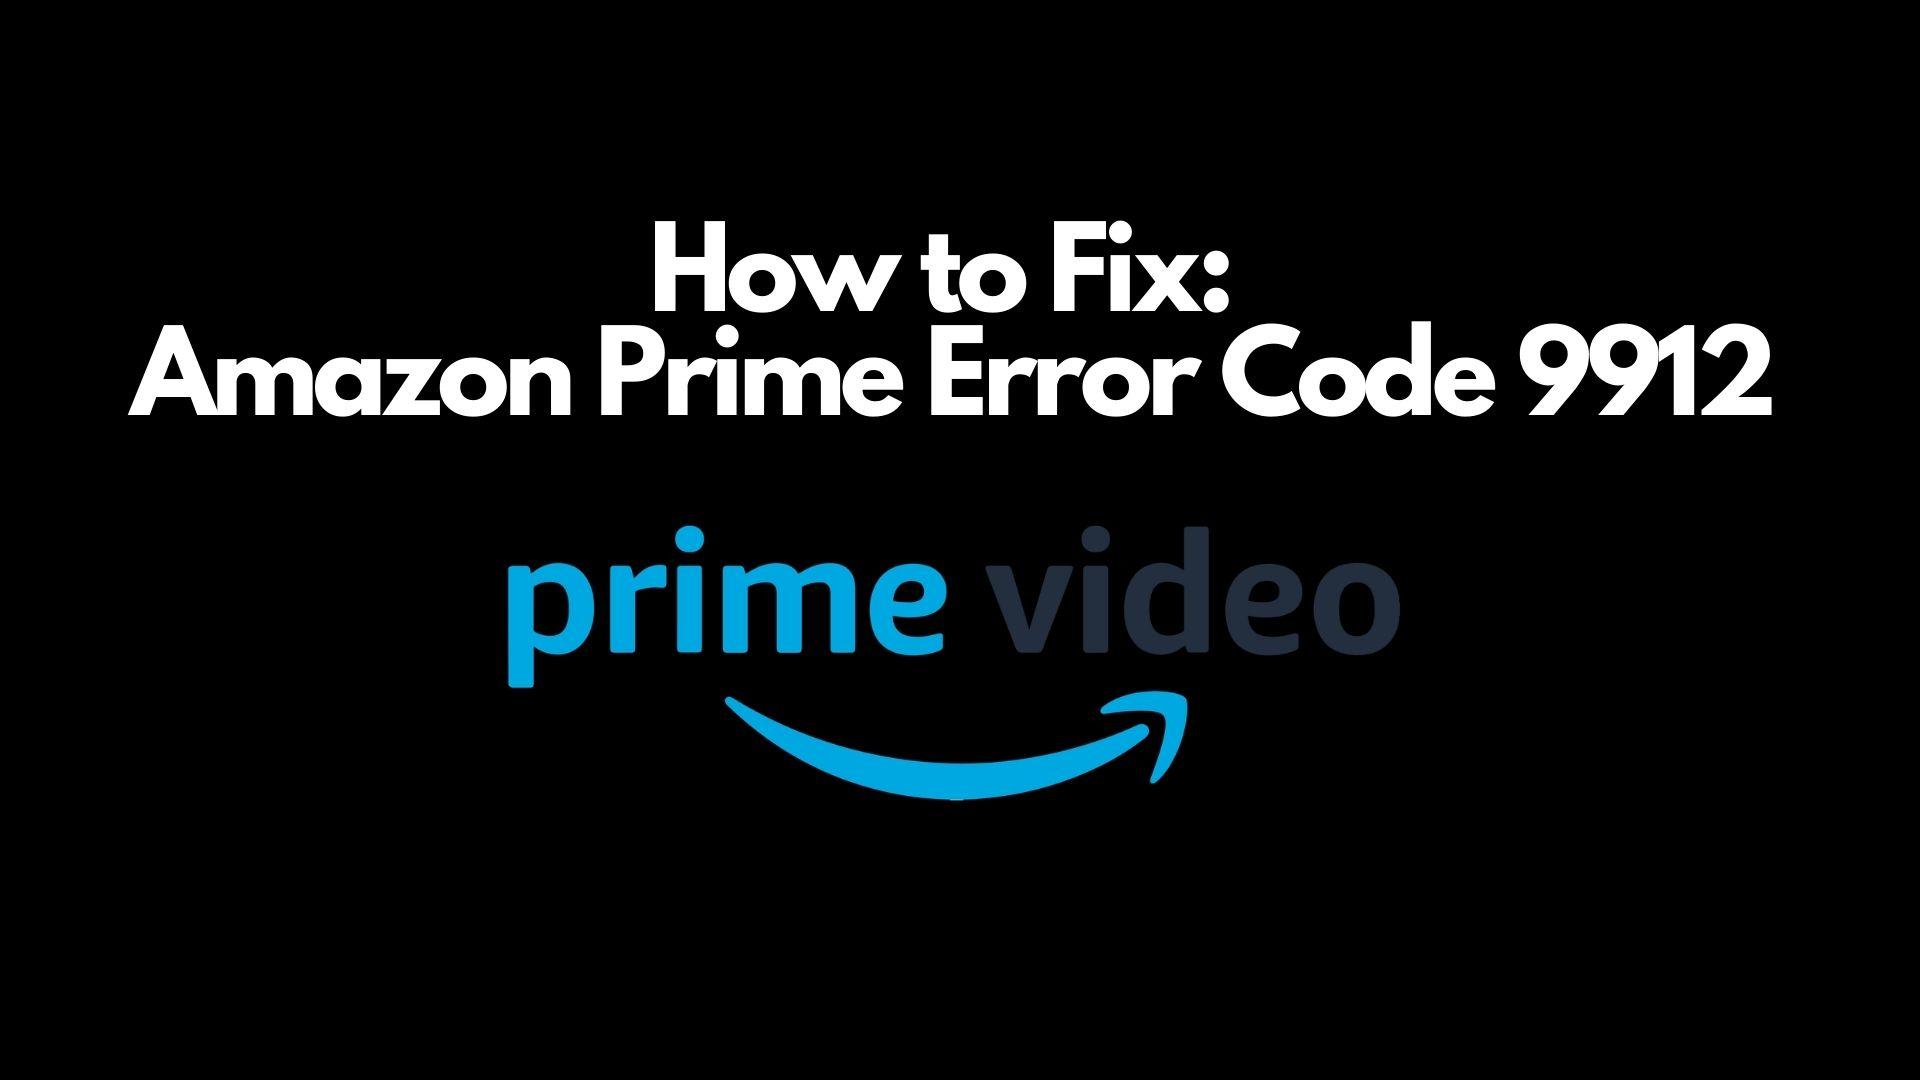 Amazon Prime Error Code 9912